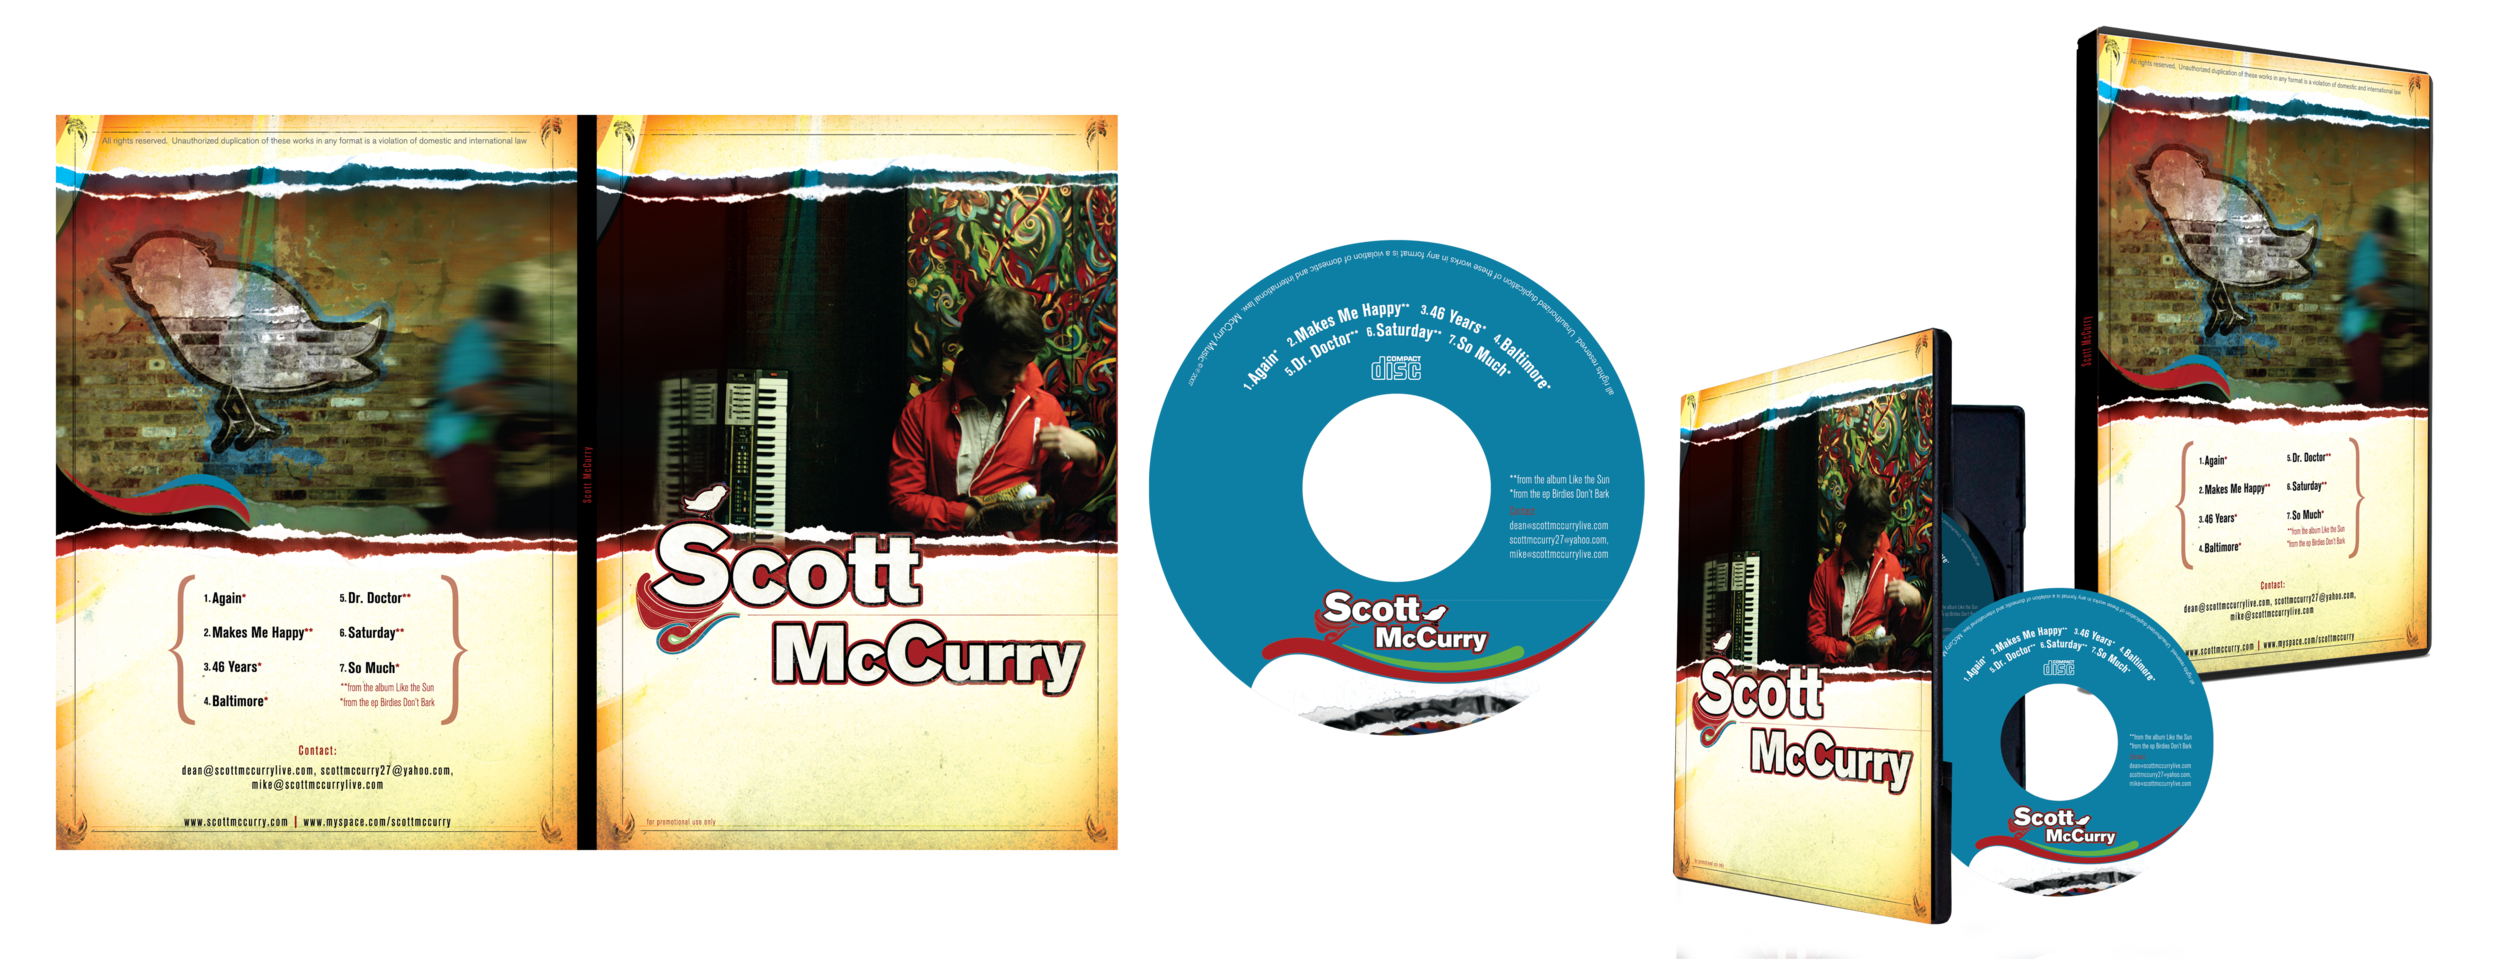 SCOTT MCCURRY BIRDIES DON'T BARK PROMO DVD {DESIGN, PHOTOGRAPHY, AND ILLUSTRATION}